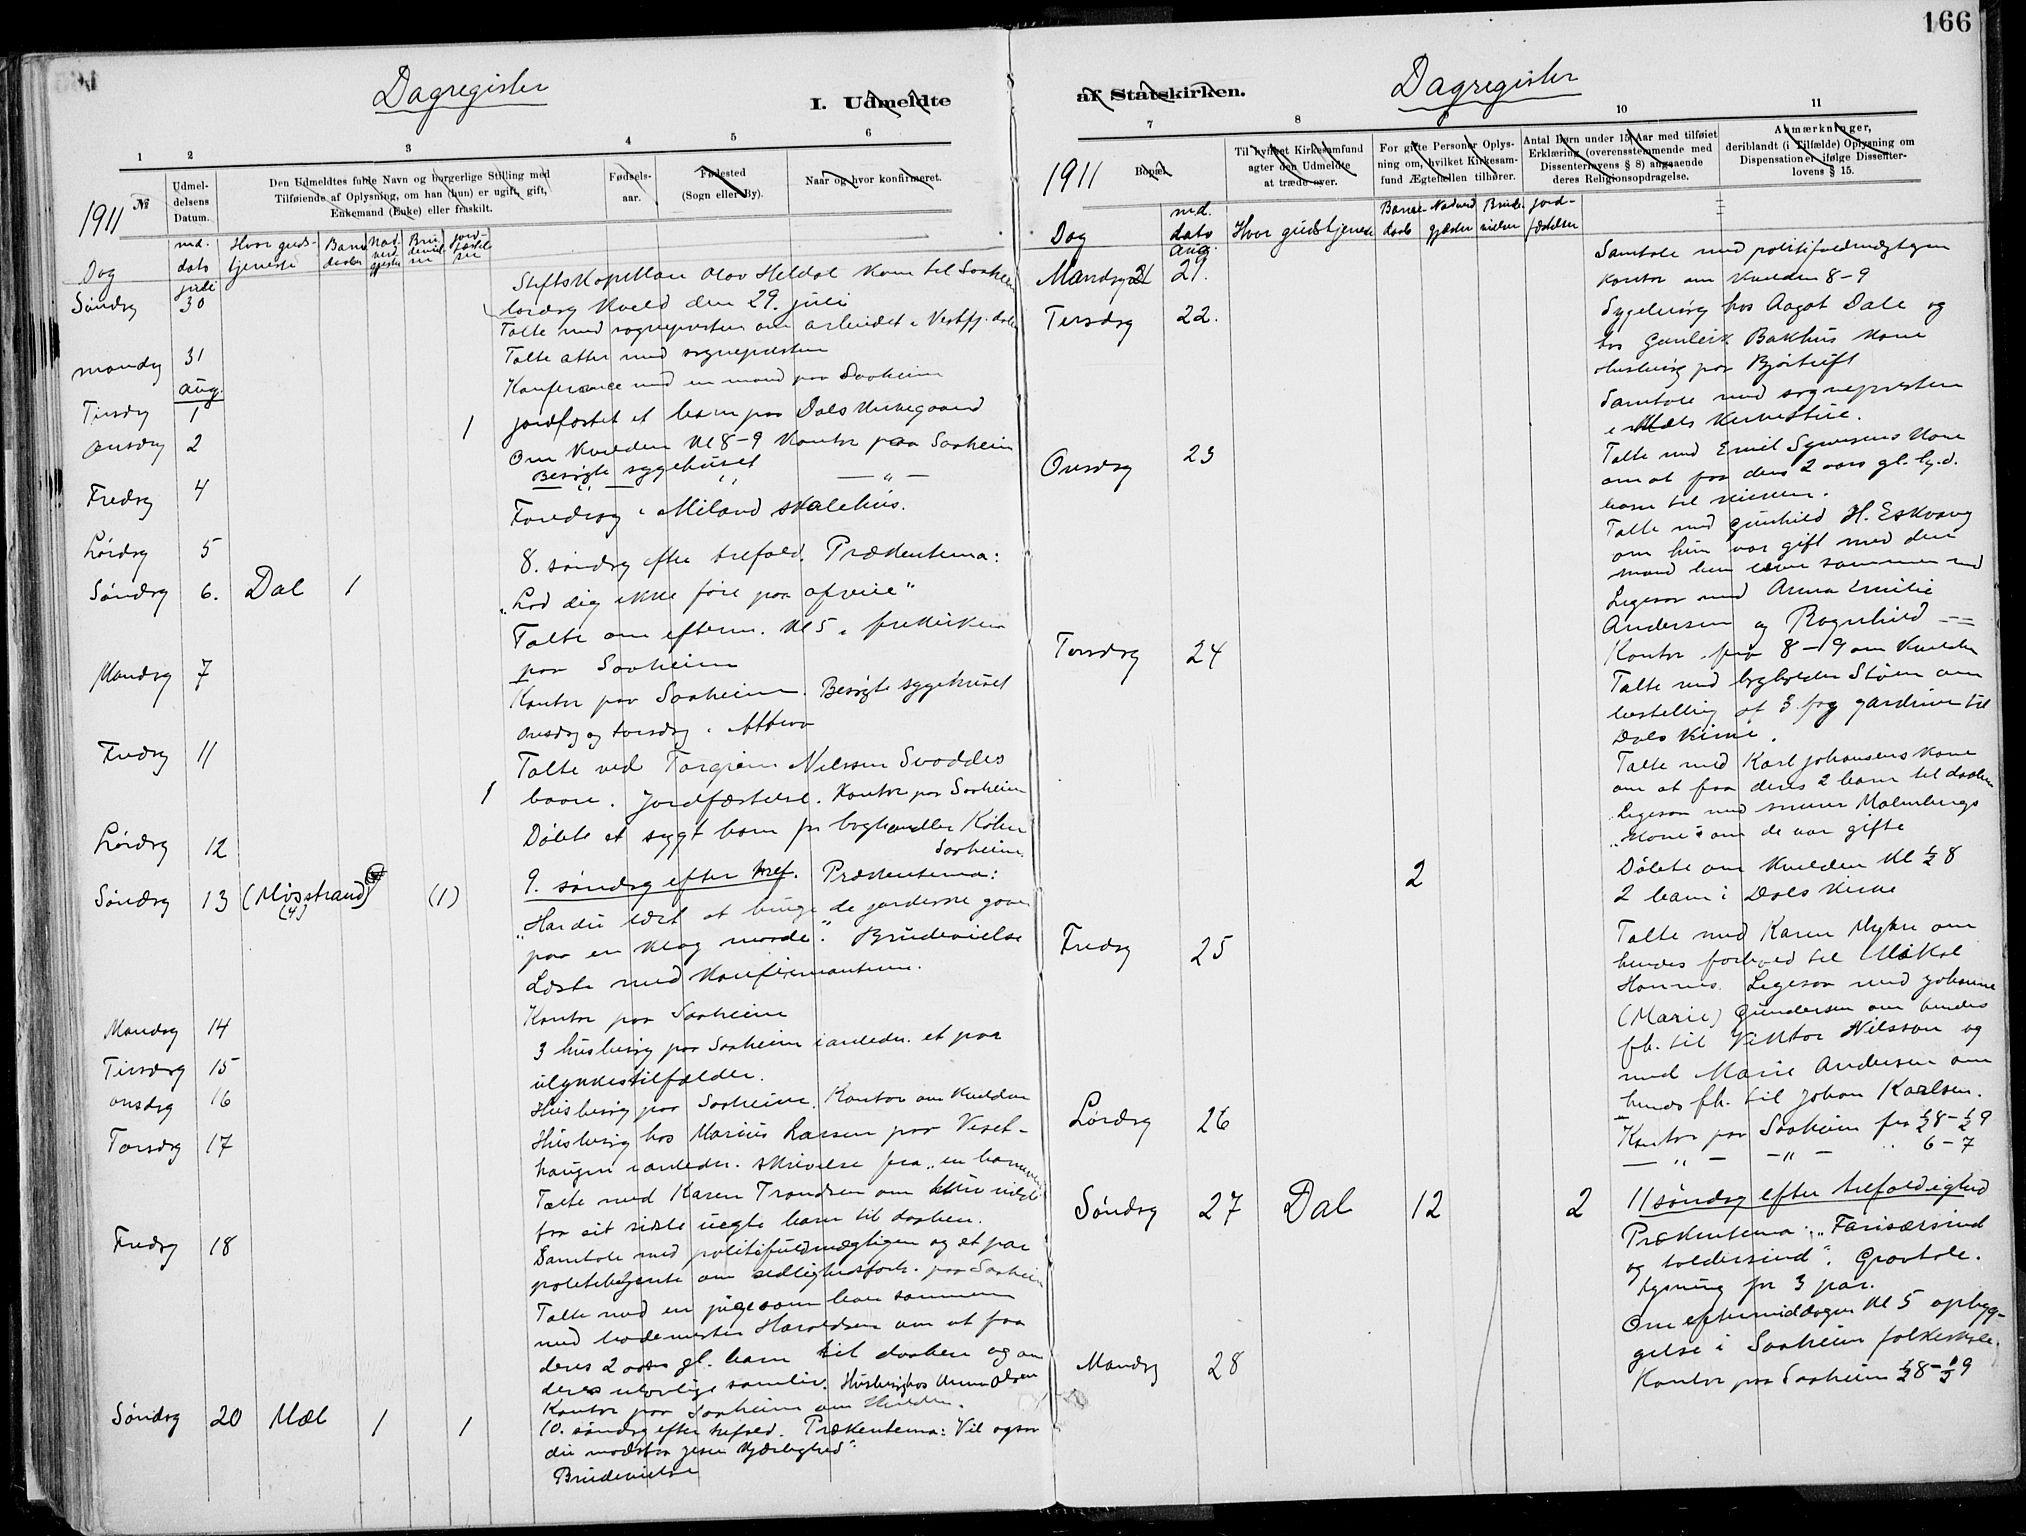 SAKO, Rjukan kirkebøker, F/Fa/L0001: Ministerialbok nr. 1, 1878-1912, s. 166